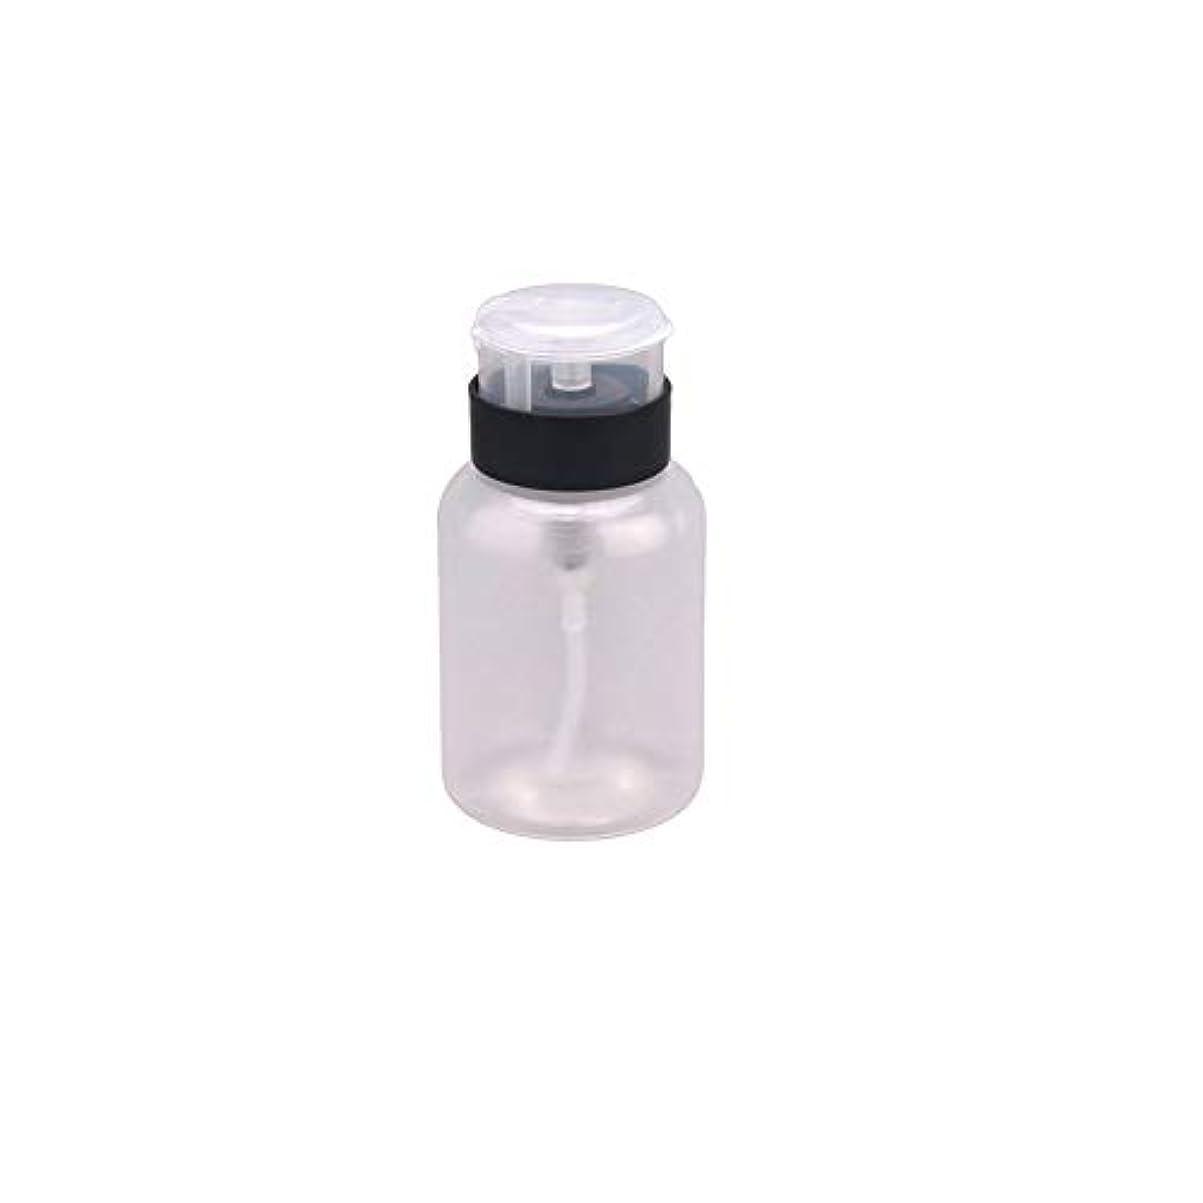 210ML MultifuktionディスペンサーポンプクレンザーBottlePushネイルポリッシュリムーバーアルコールボトルダウン液体エミッタのボトルは、ボトルのネイルポリッシュリムーバー液体ボトル容器のforoils...